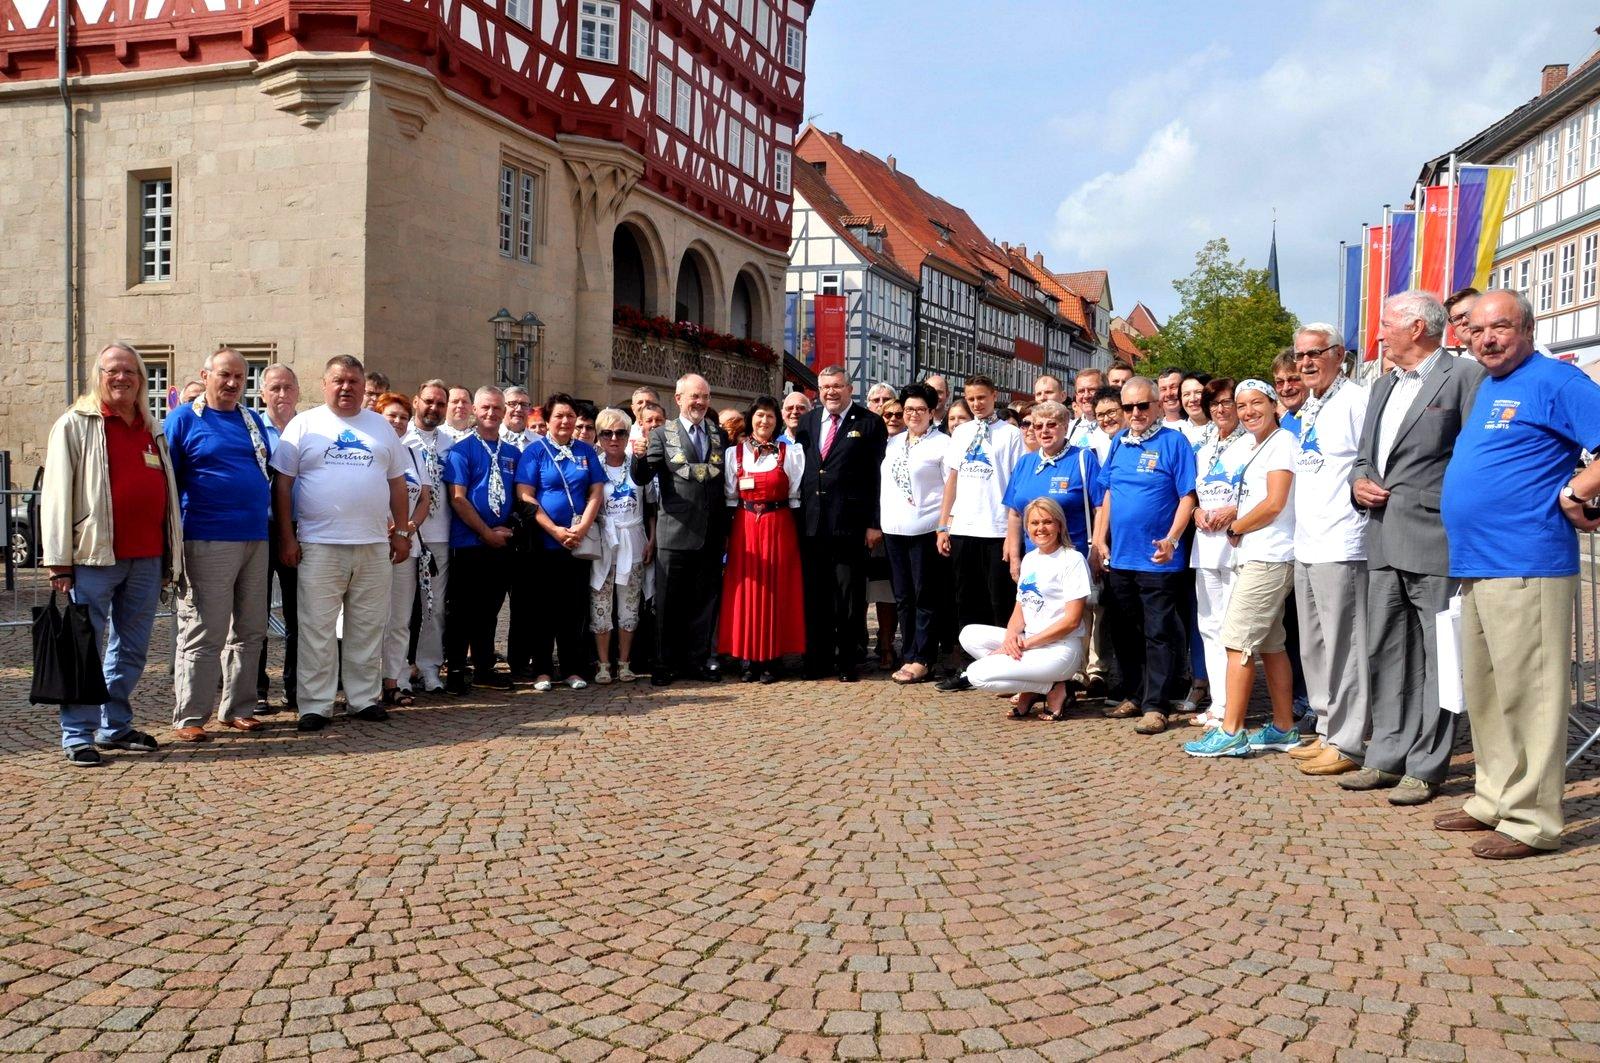 25-lecie partnerstwa gminy Kartuzy i miasta Duderstadt 8